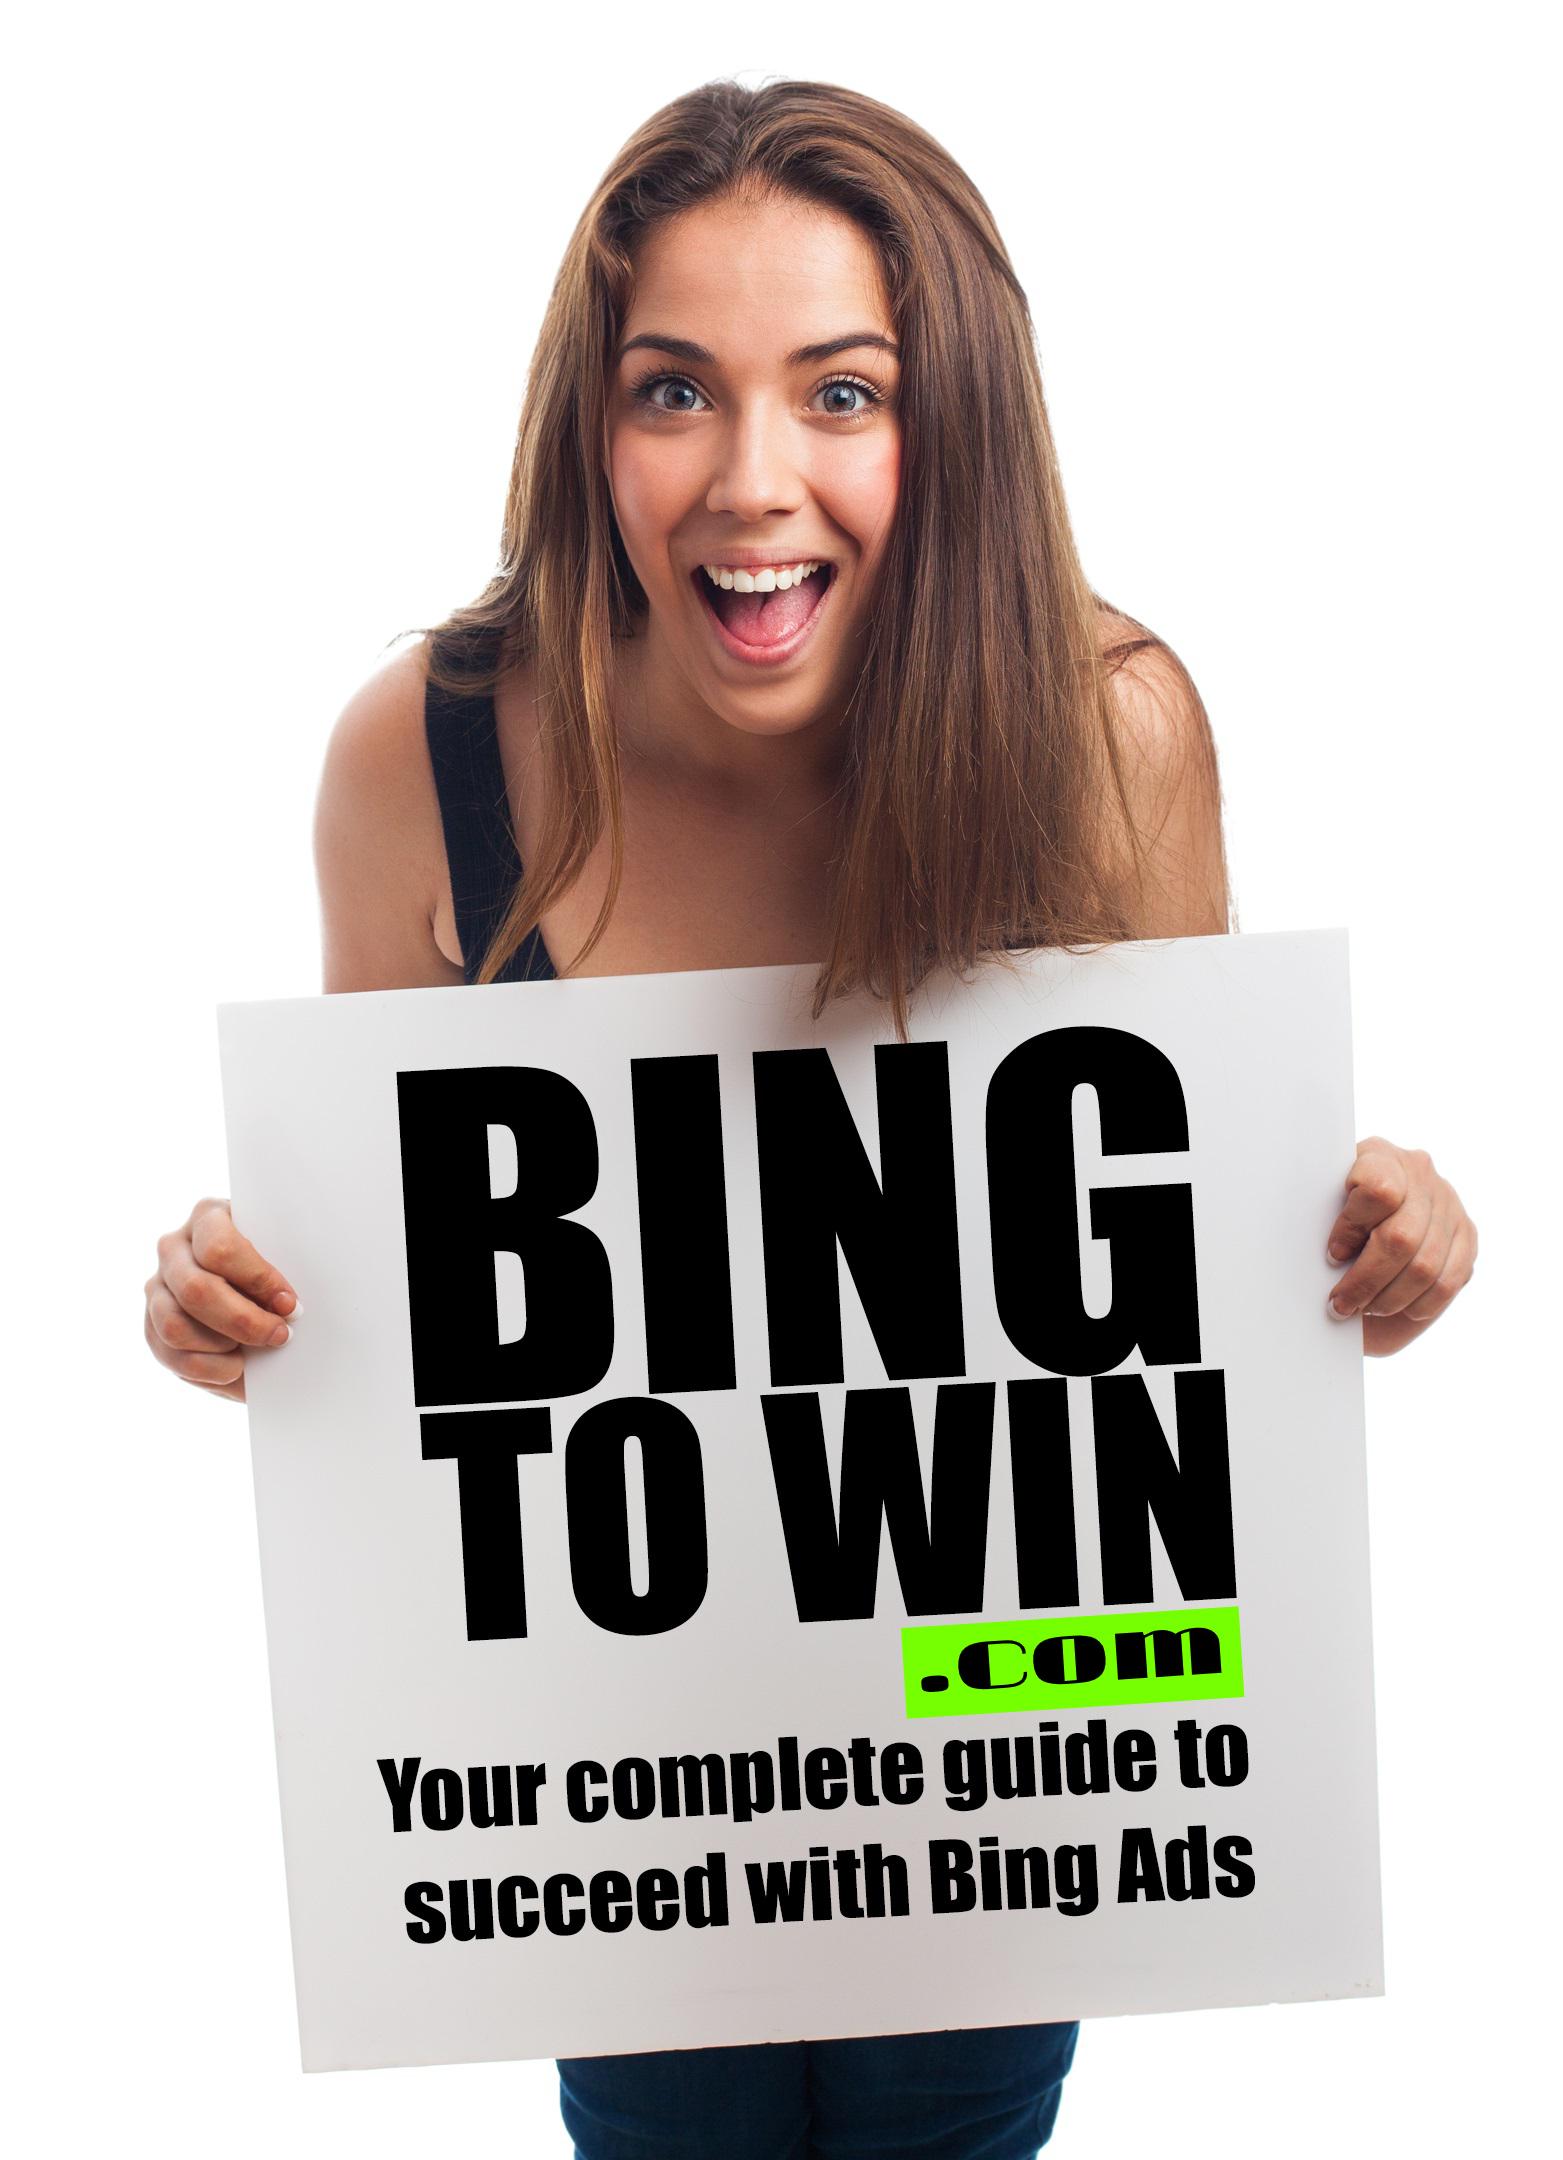 girl holding bingtowin.com sign